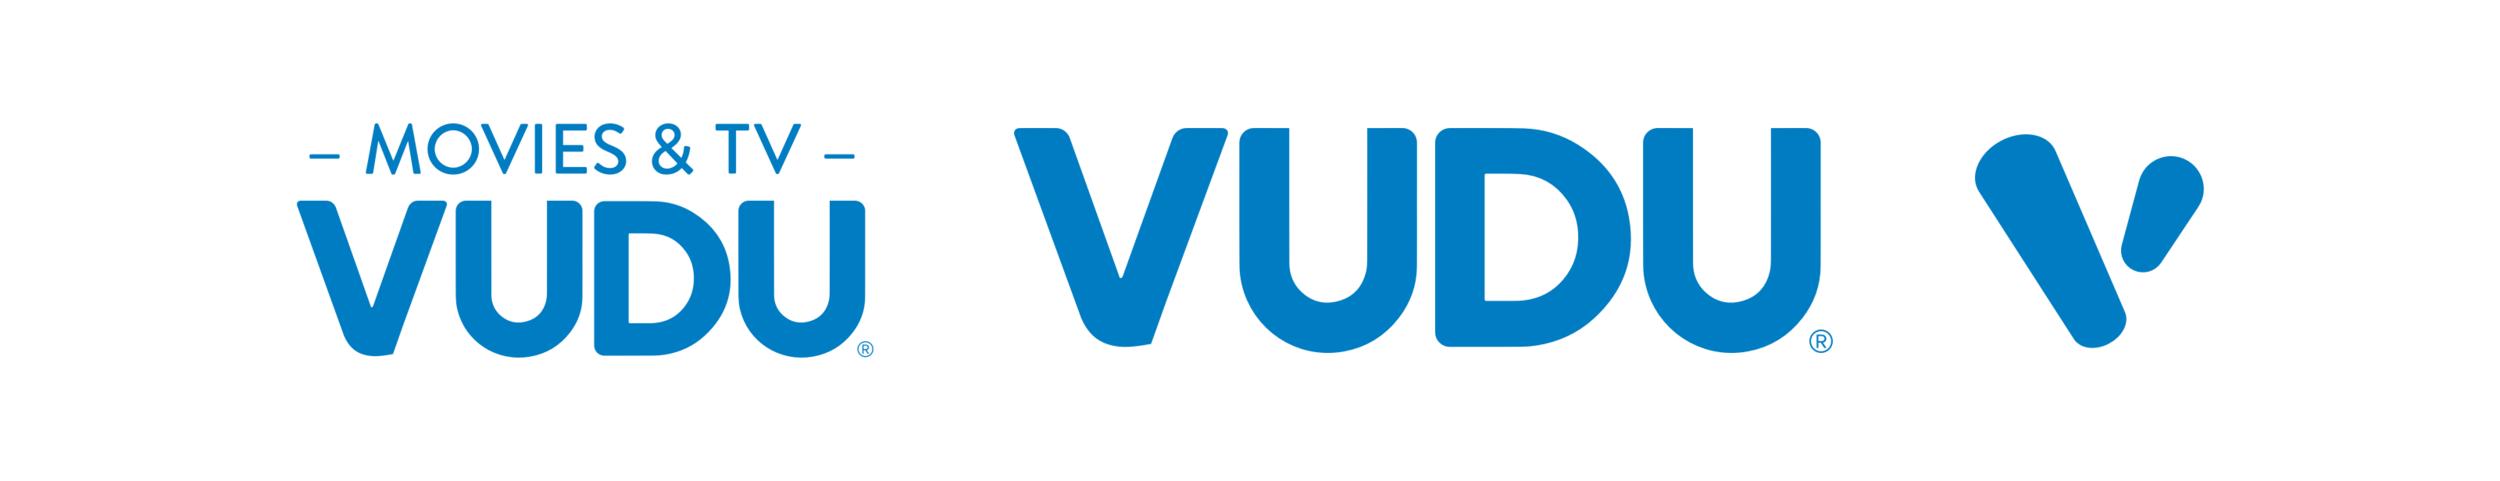 logo-brand-1.png